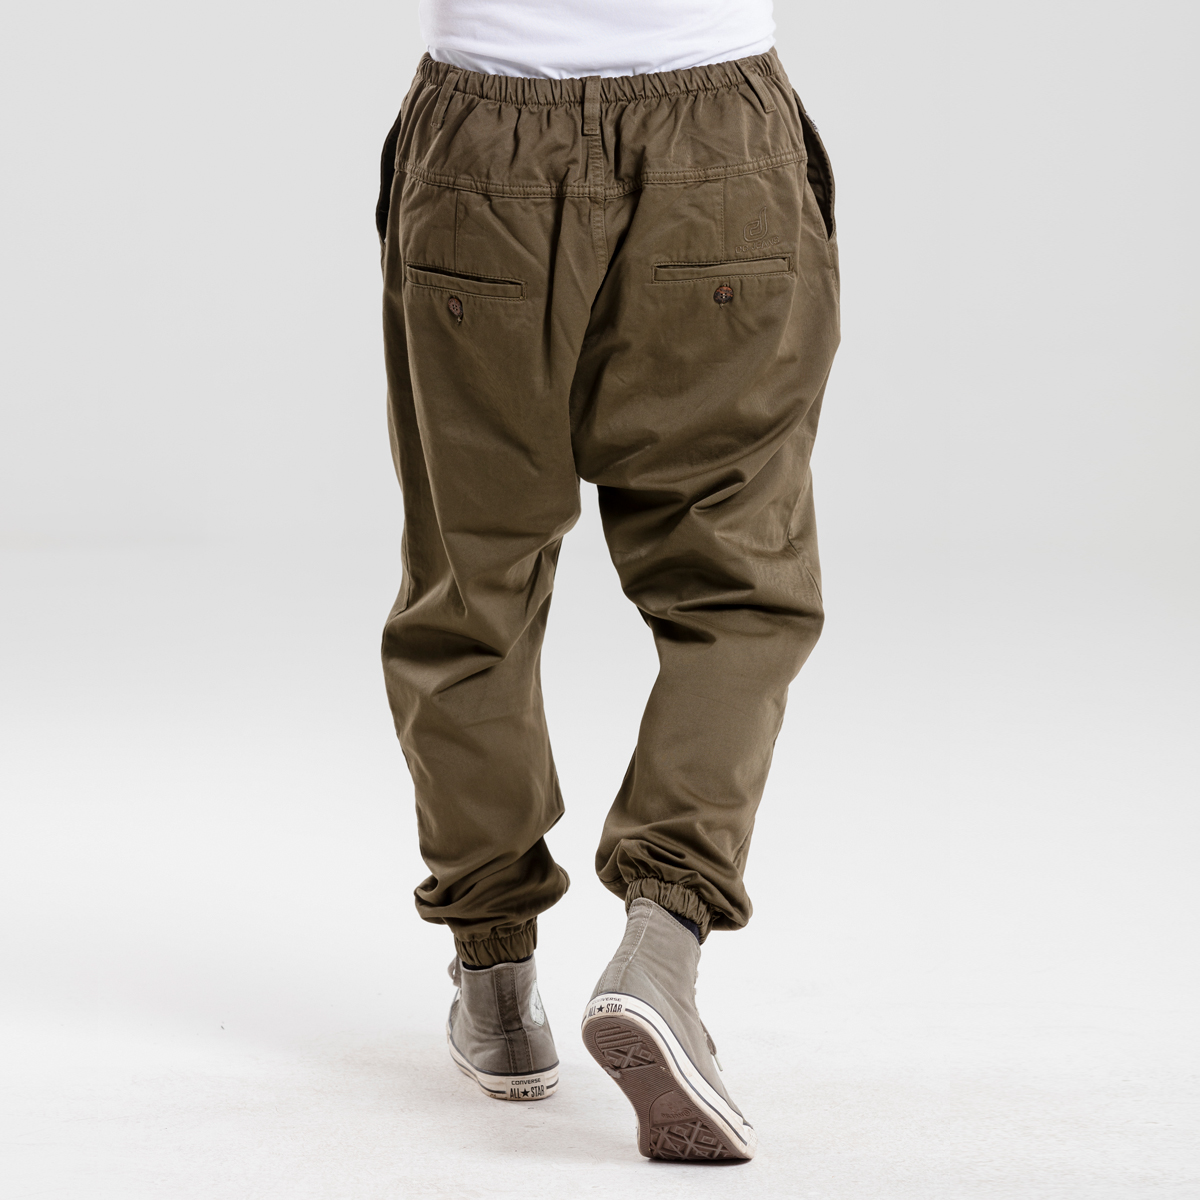 saroual jeans usual kaki dcjeans dos